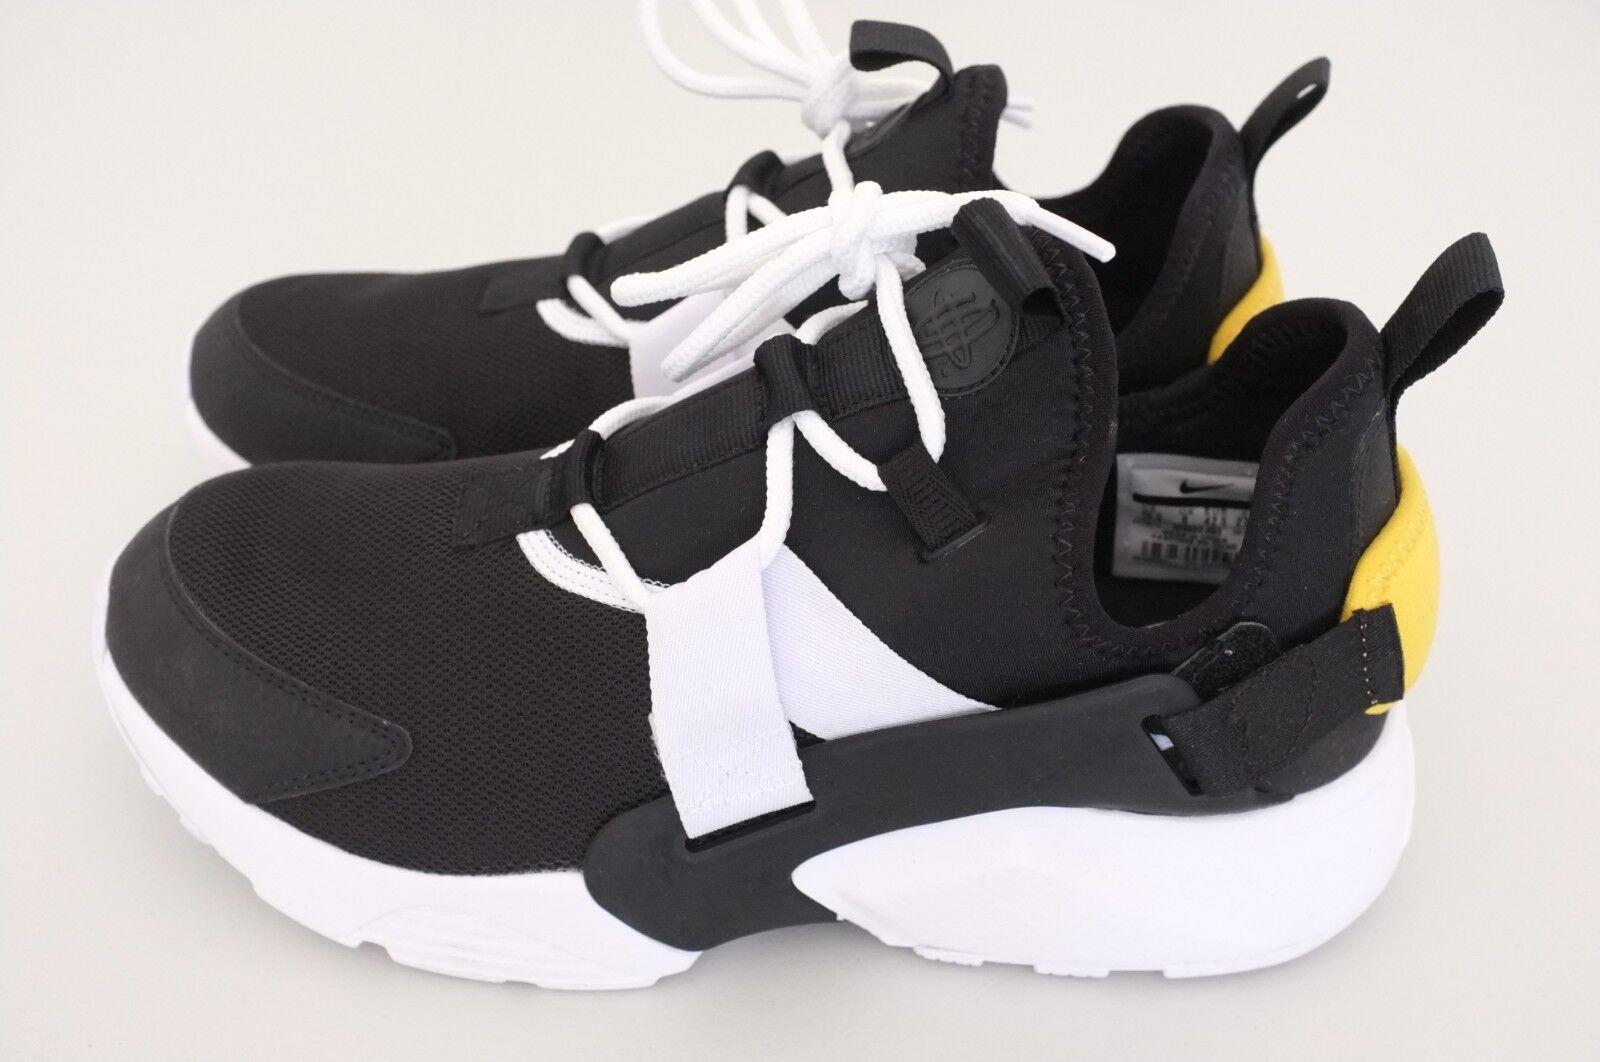 Nike Air Huarache City Low Women Athletic shoes Black White Sz 10.5 (AH6804-002)